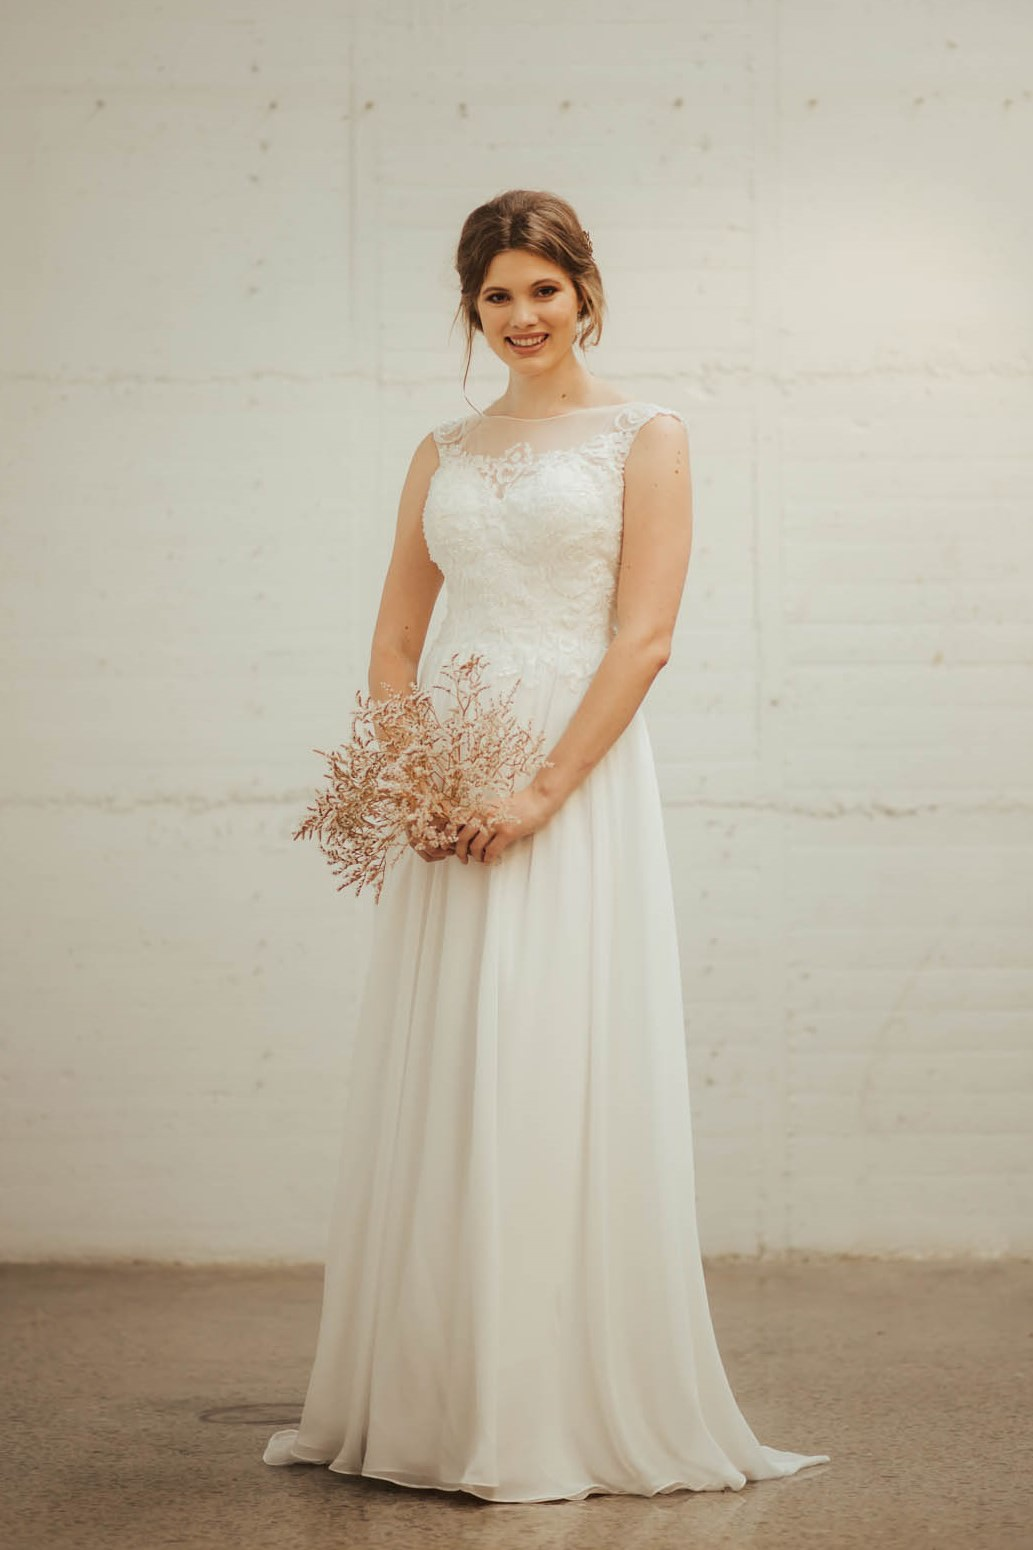 Lainee Hermsen Wedding Dress Collection - Paperswan Bride - Wedding Dress Shop - Wedding Dress Shop - Wellington - Christchurch - Azalea